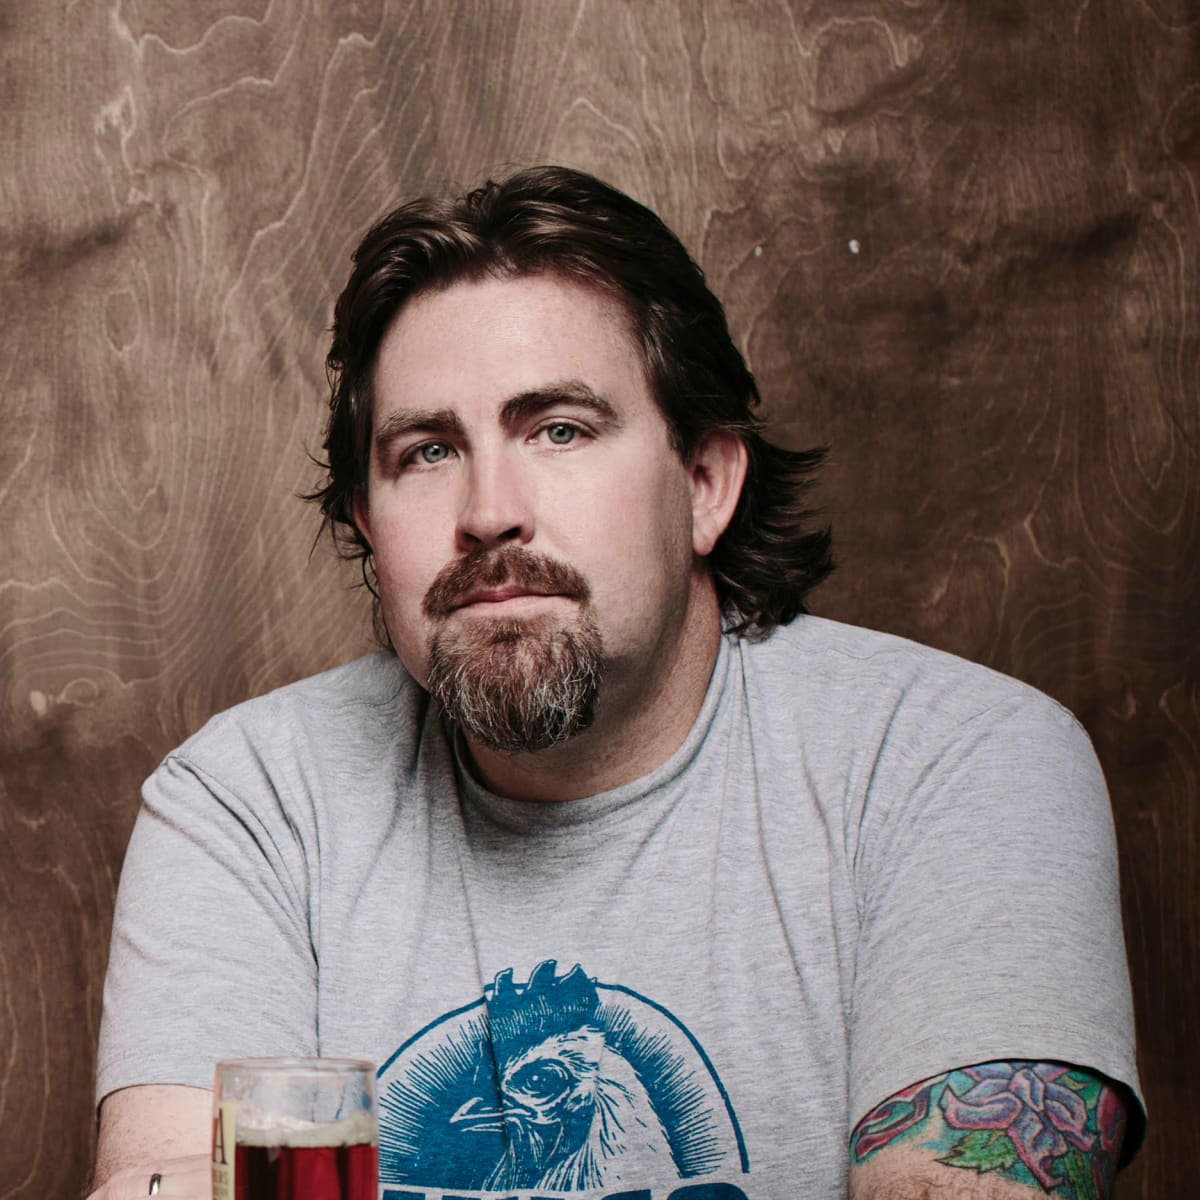 Jeff Balfour San Antonio chef Southerleigh Fine Food & Brewery